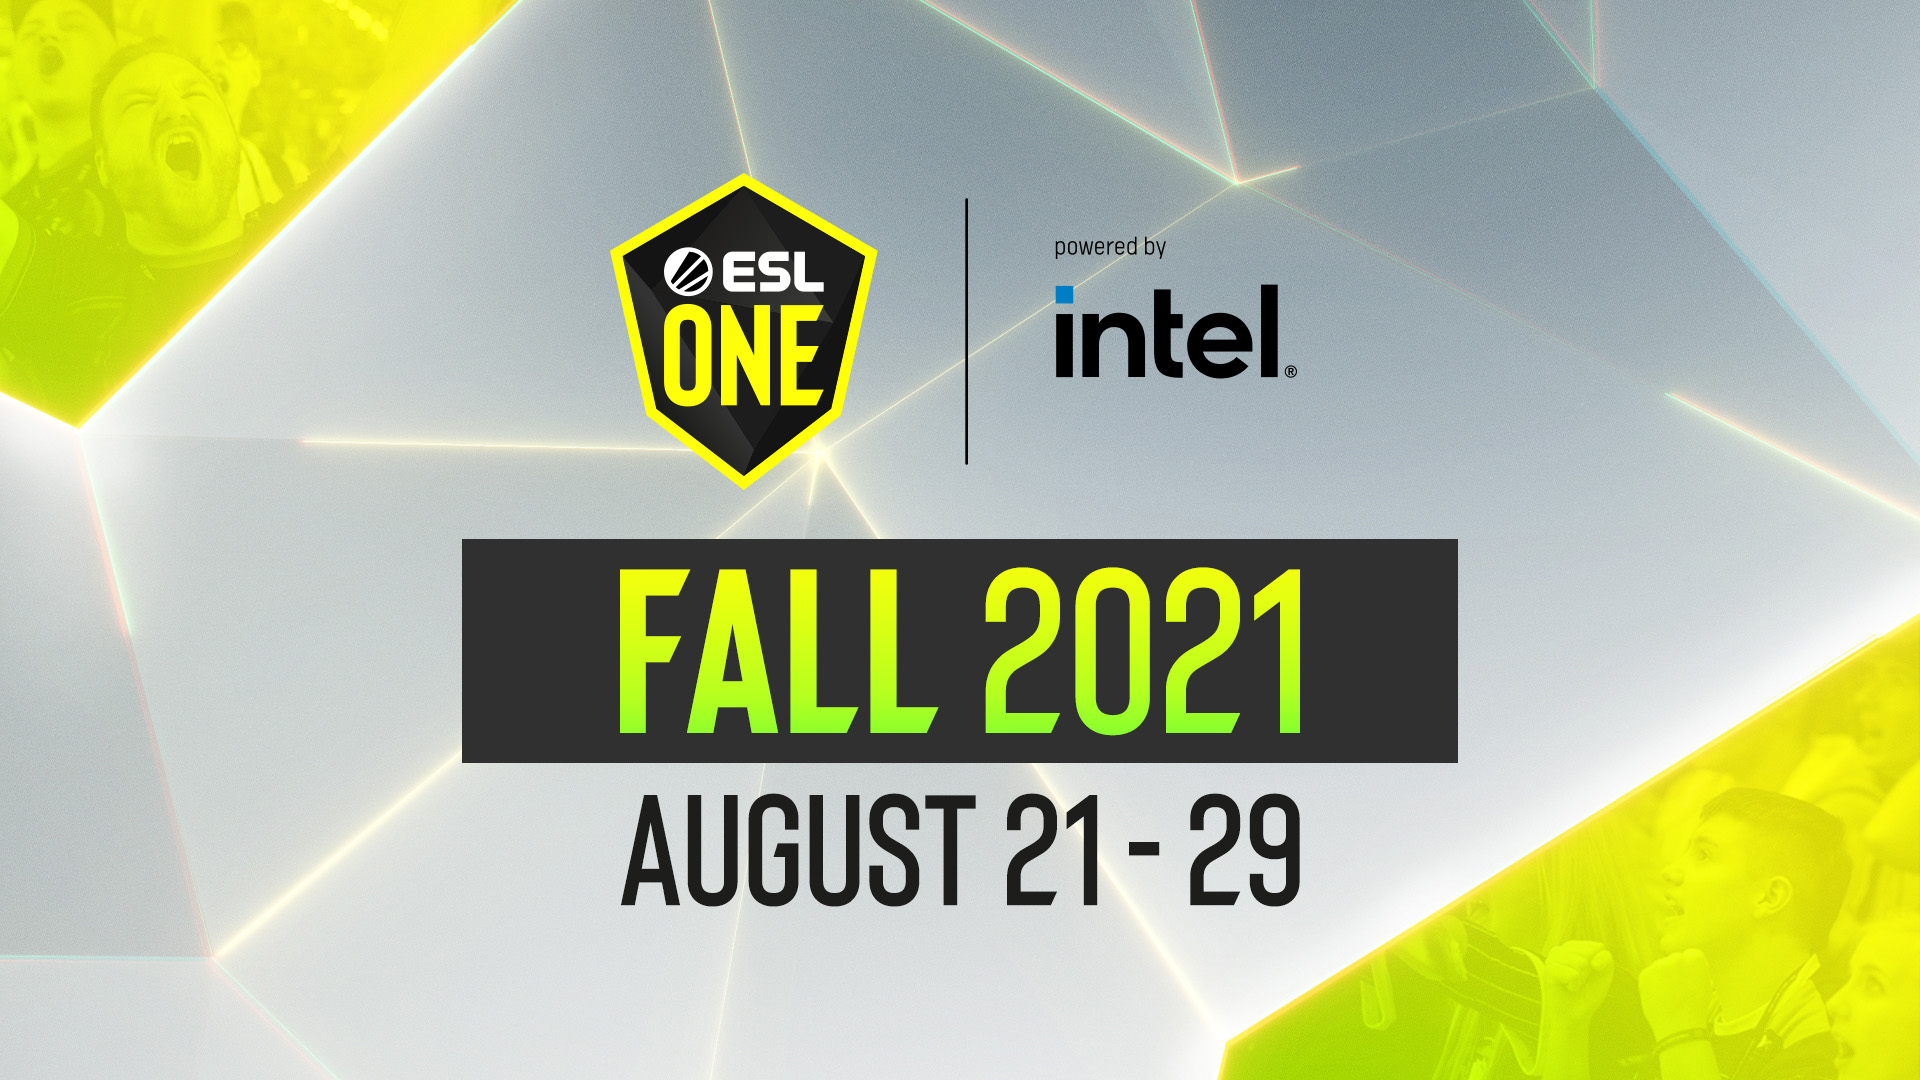 Foto de Dota 2: Thunder Predator, beastcoast y SG esports son invitados al torneo ESL One Fall 2021